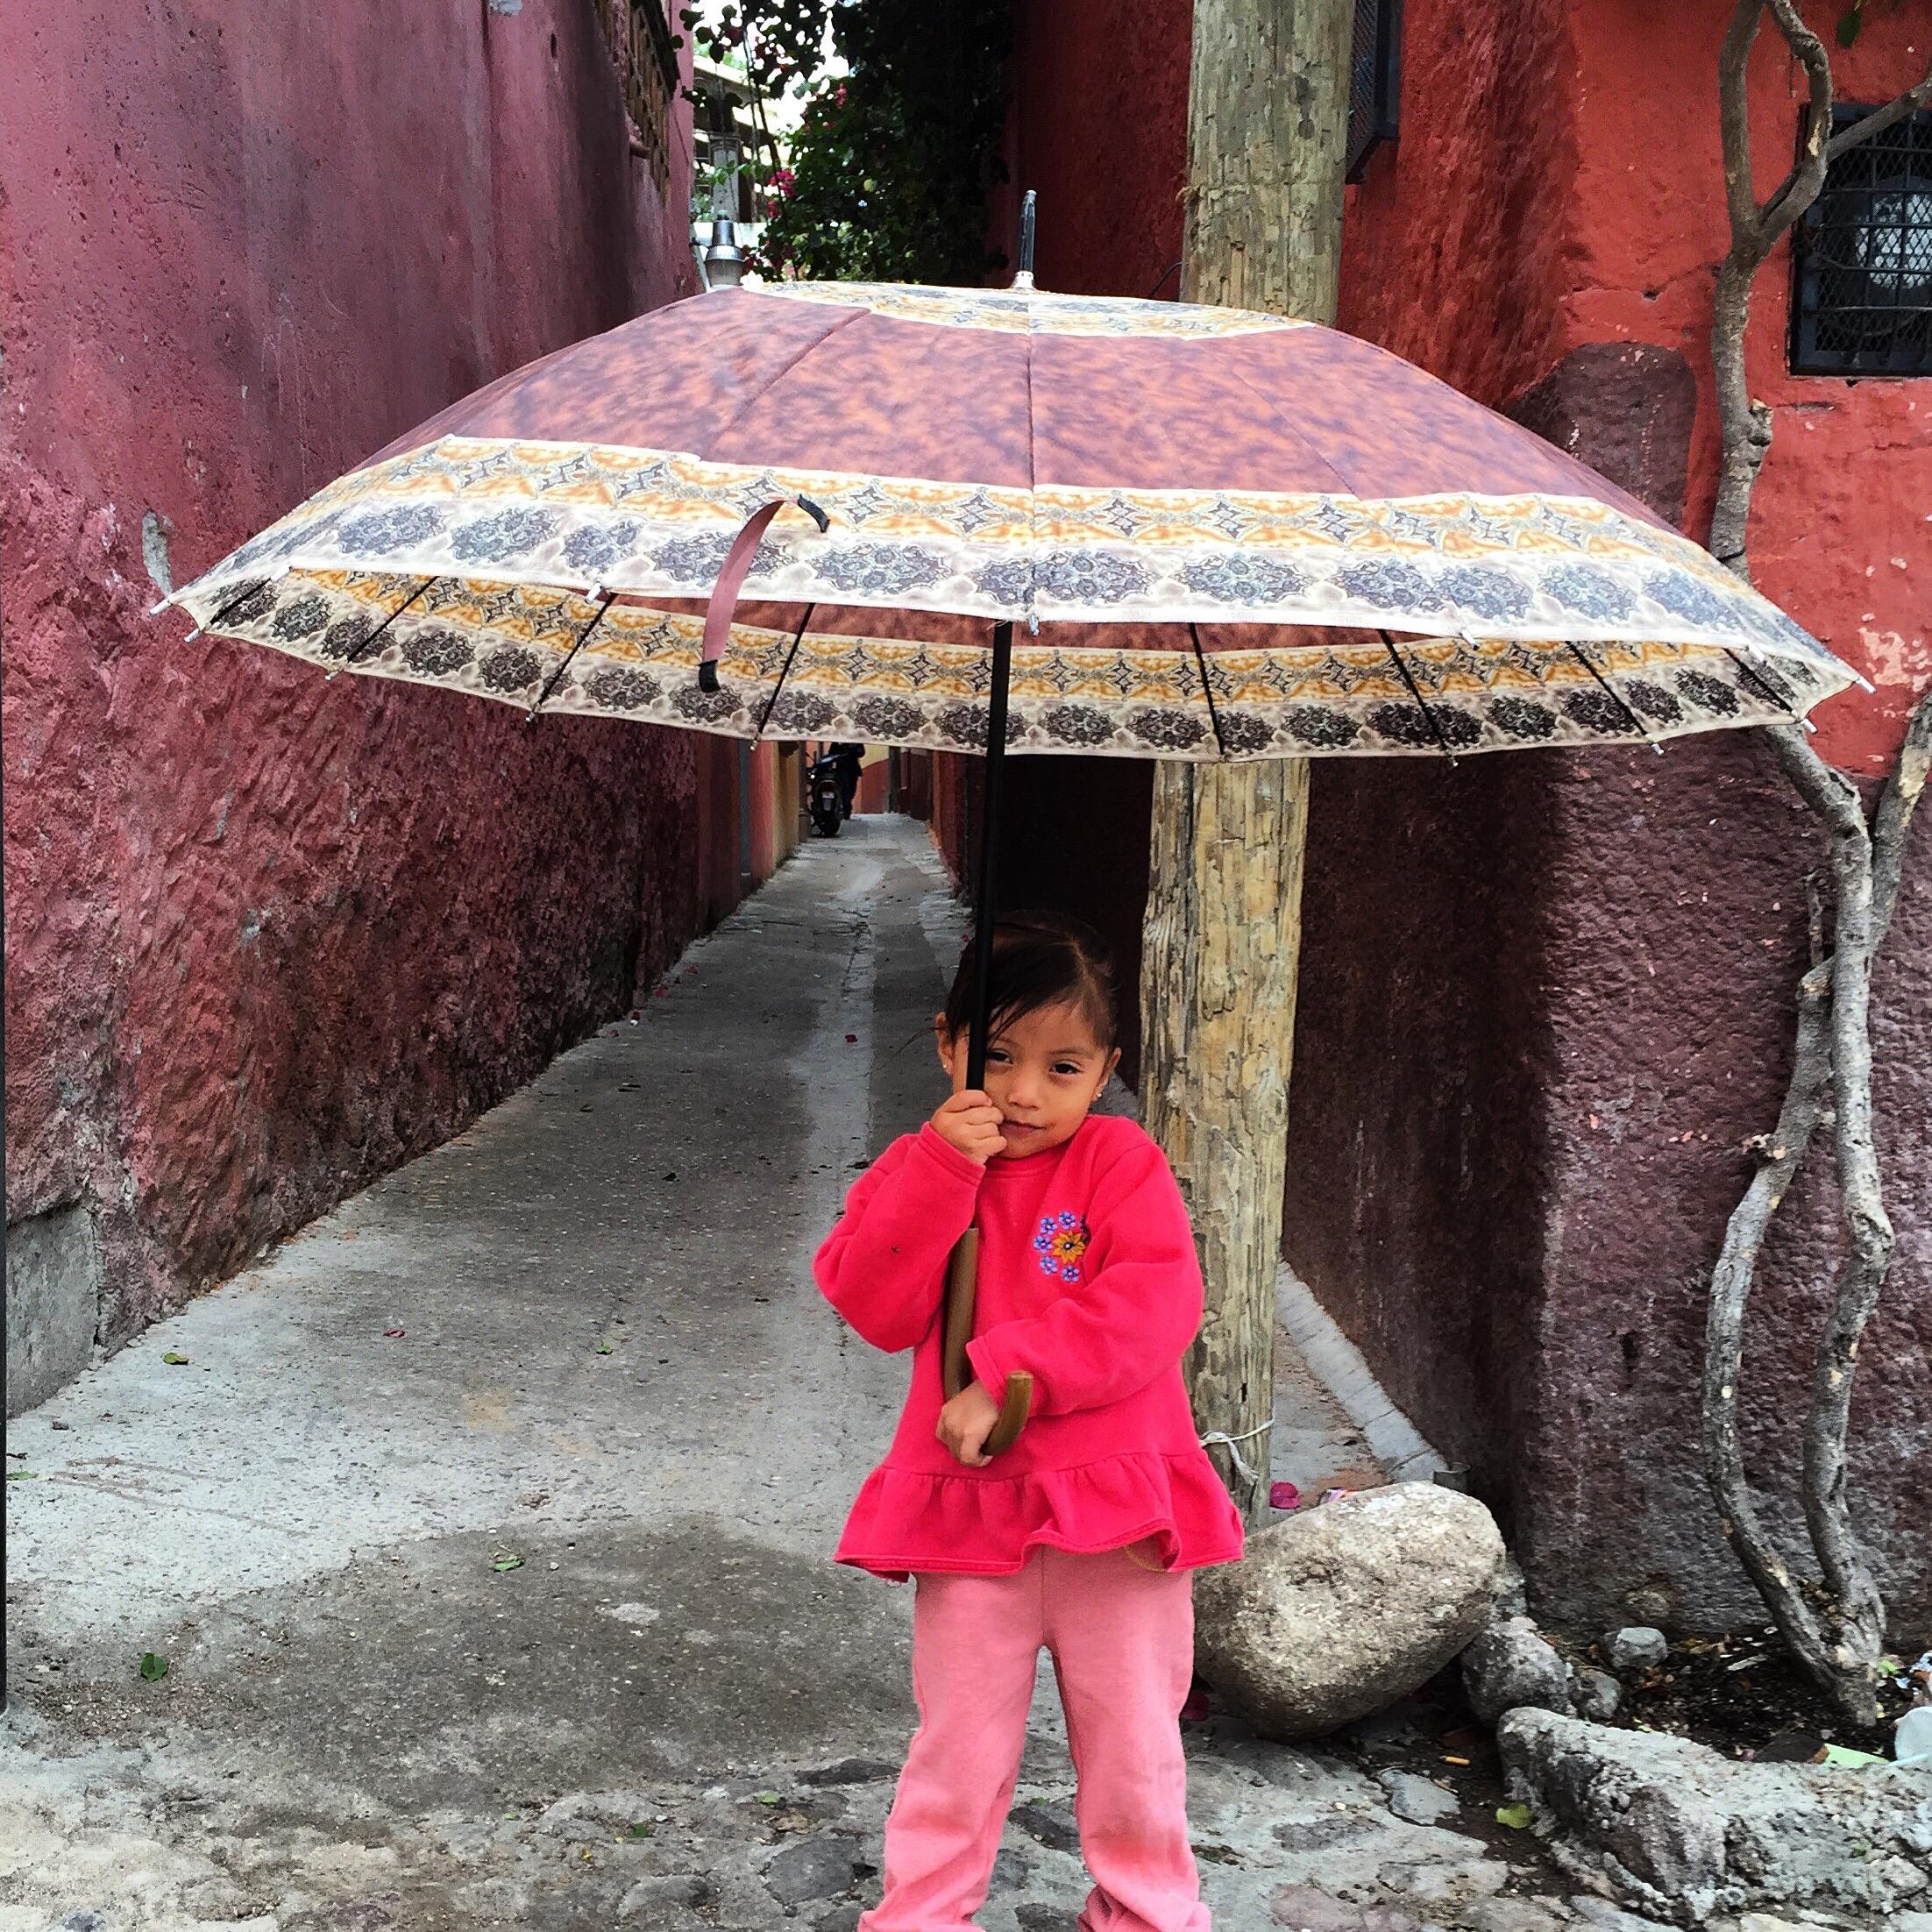 Girl umbrella IMG_5010 copy.JPG